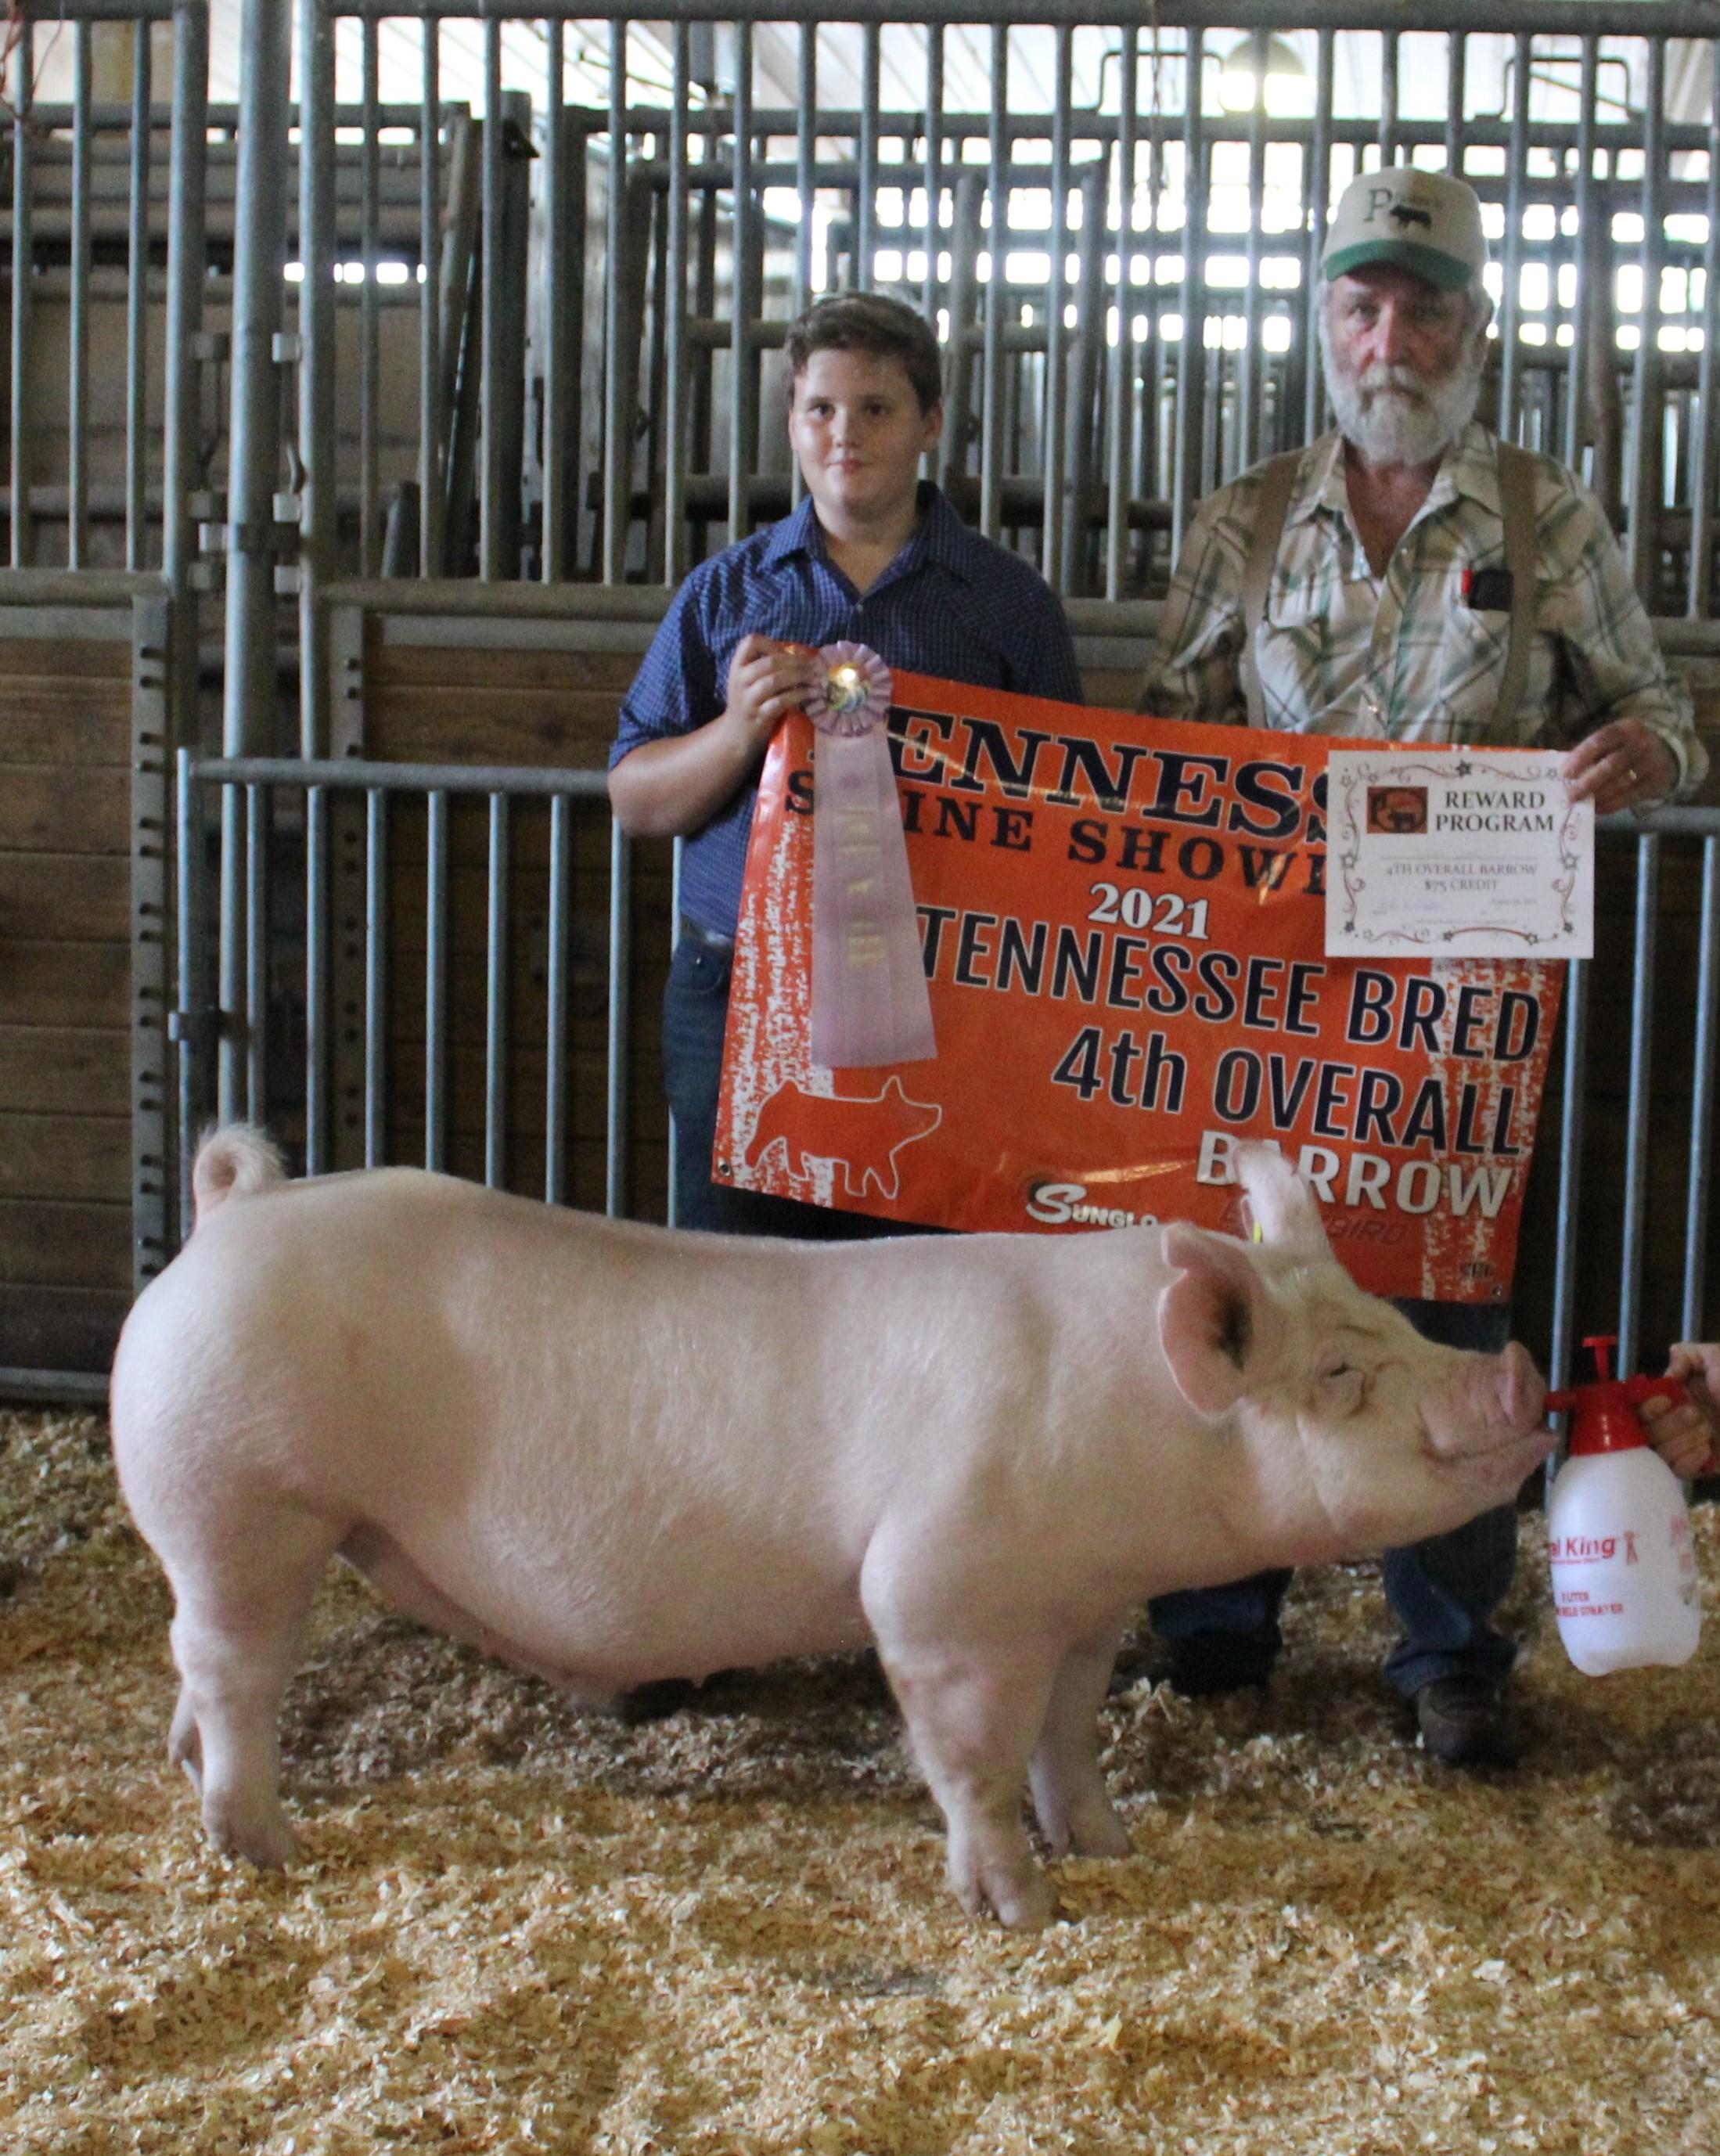 Tylan Lusk 2021 TN Swine Showdown Champion Yorkshire Barrow  (TN Kids Only) Reserve Champion Yorkshire Barrow (TN Bred) 4th Overall Barrow (TN Bred)